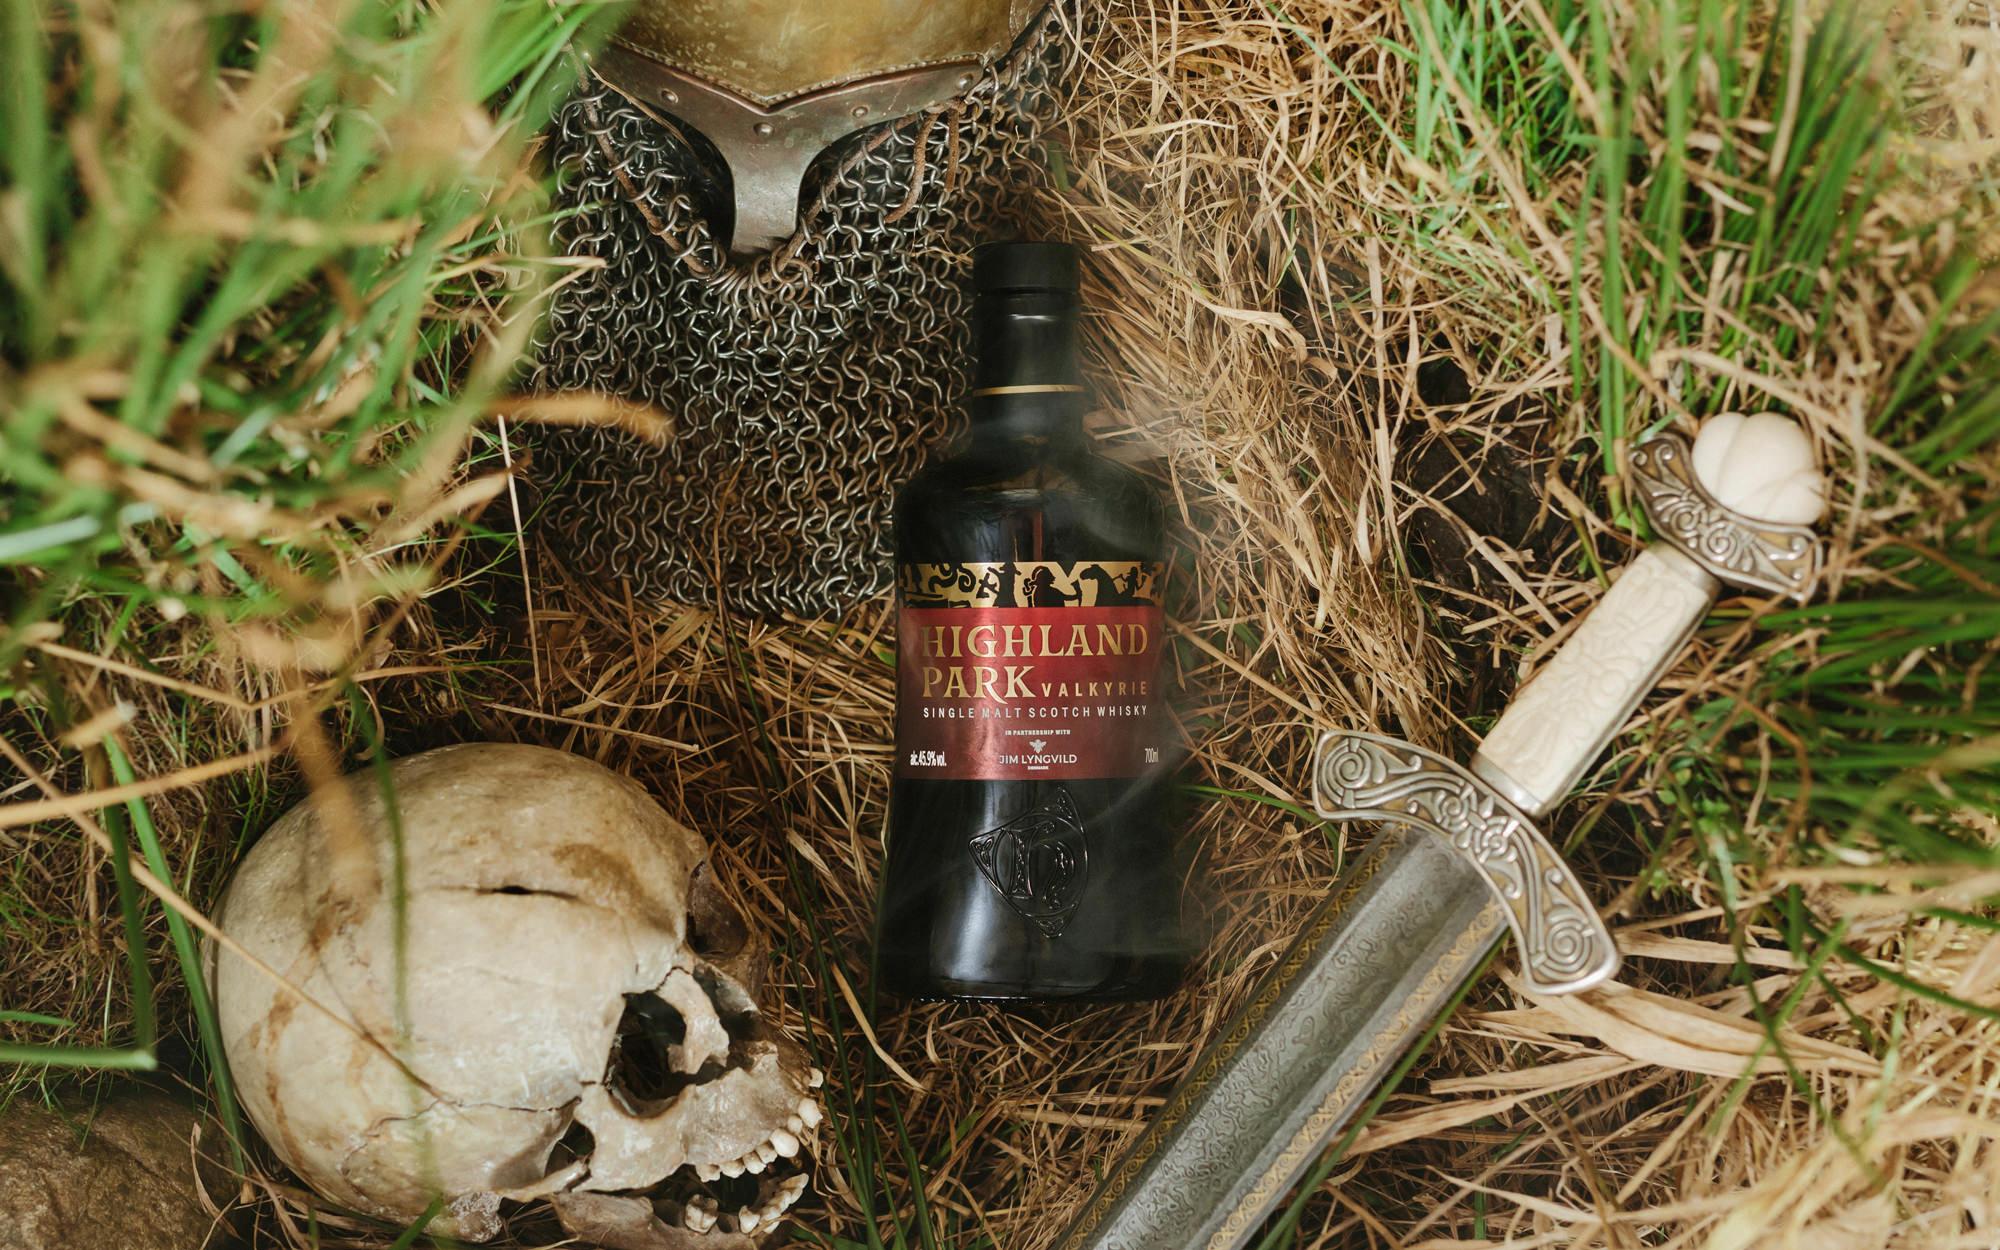 product-photography-glasgow-highland-park-valkyrie-walnut-wasp.jpg